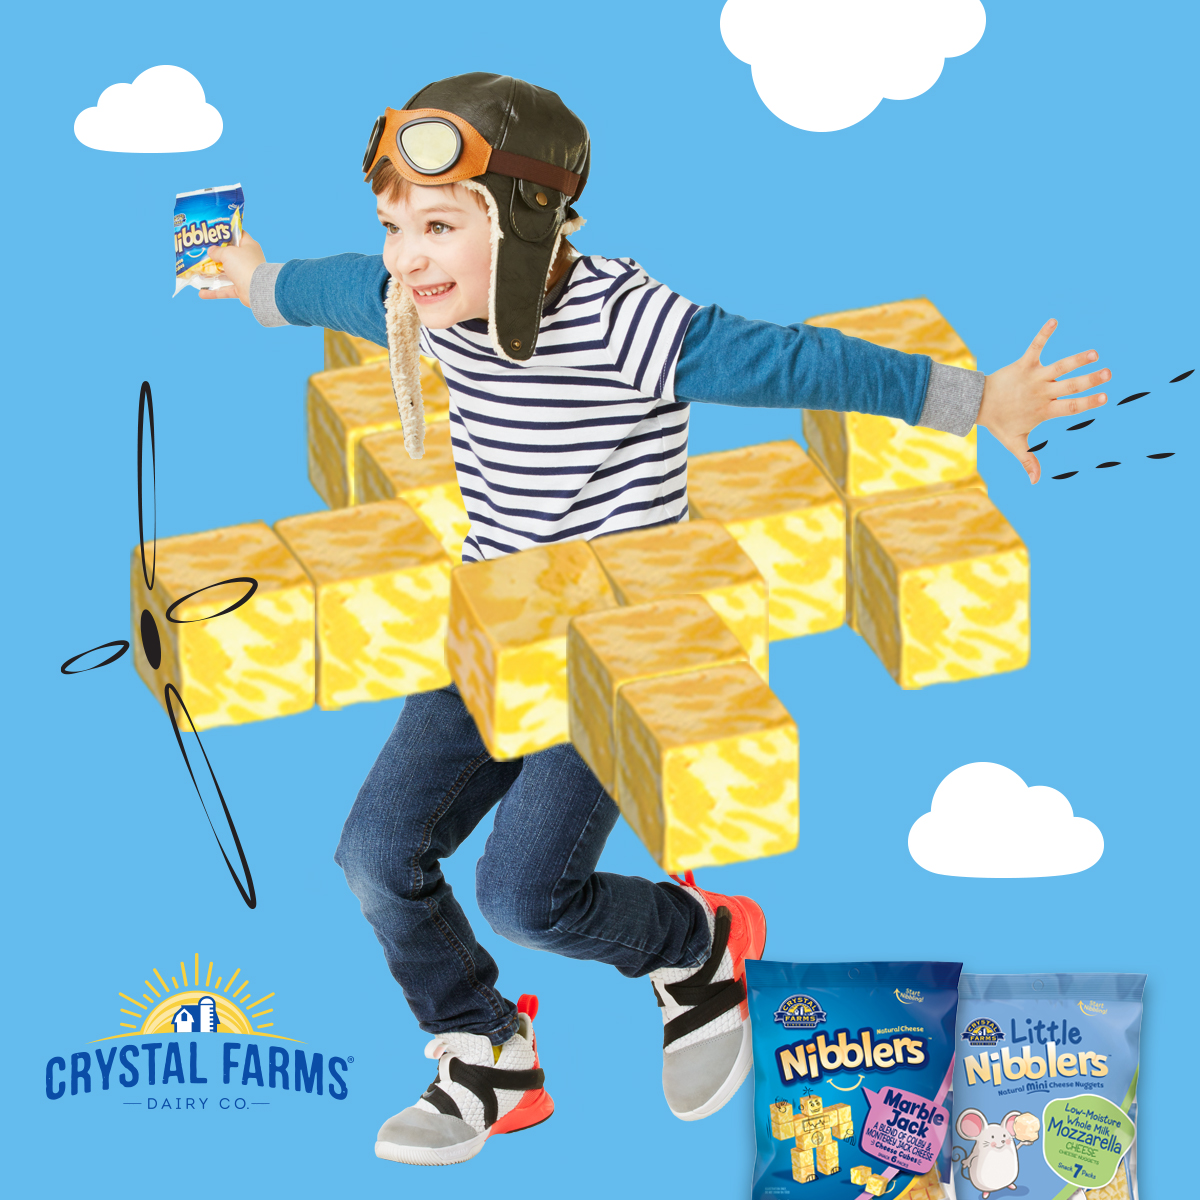 Crystal Farms boy flying in cheese plane